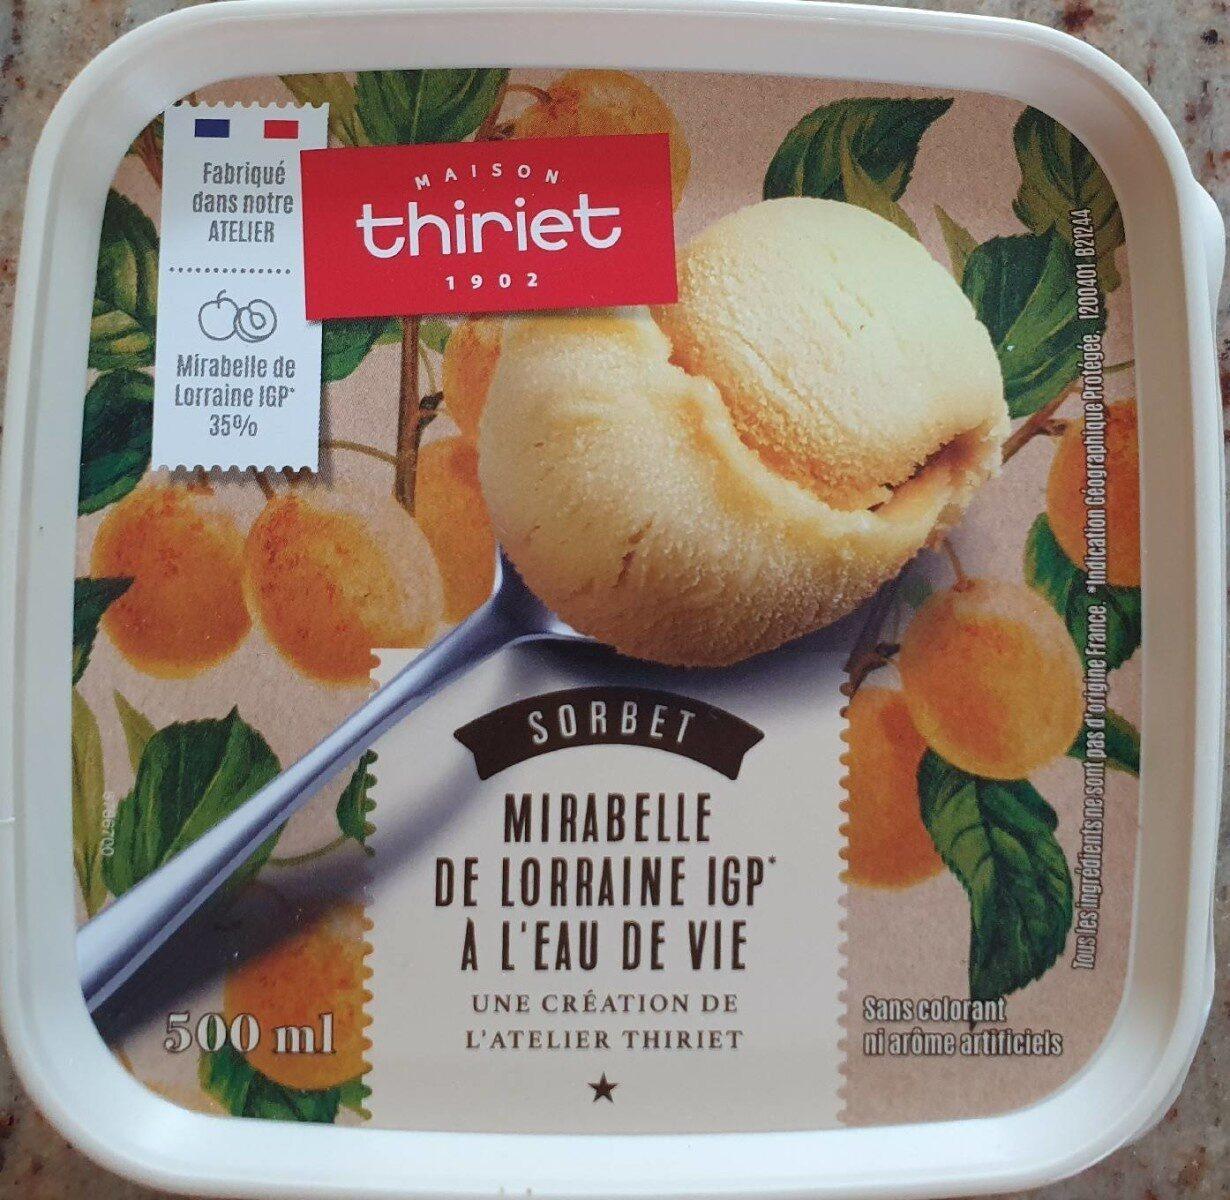 Sorbet Mirabelle de Lorraine - Product - fr